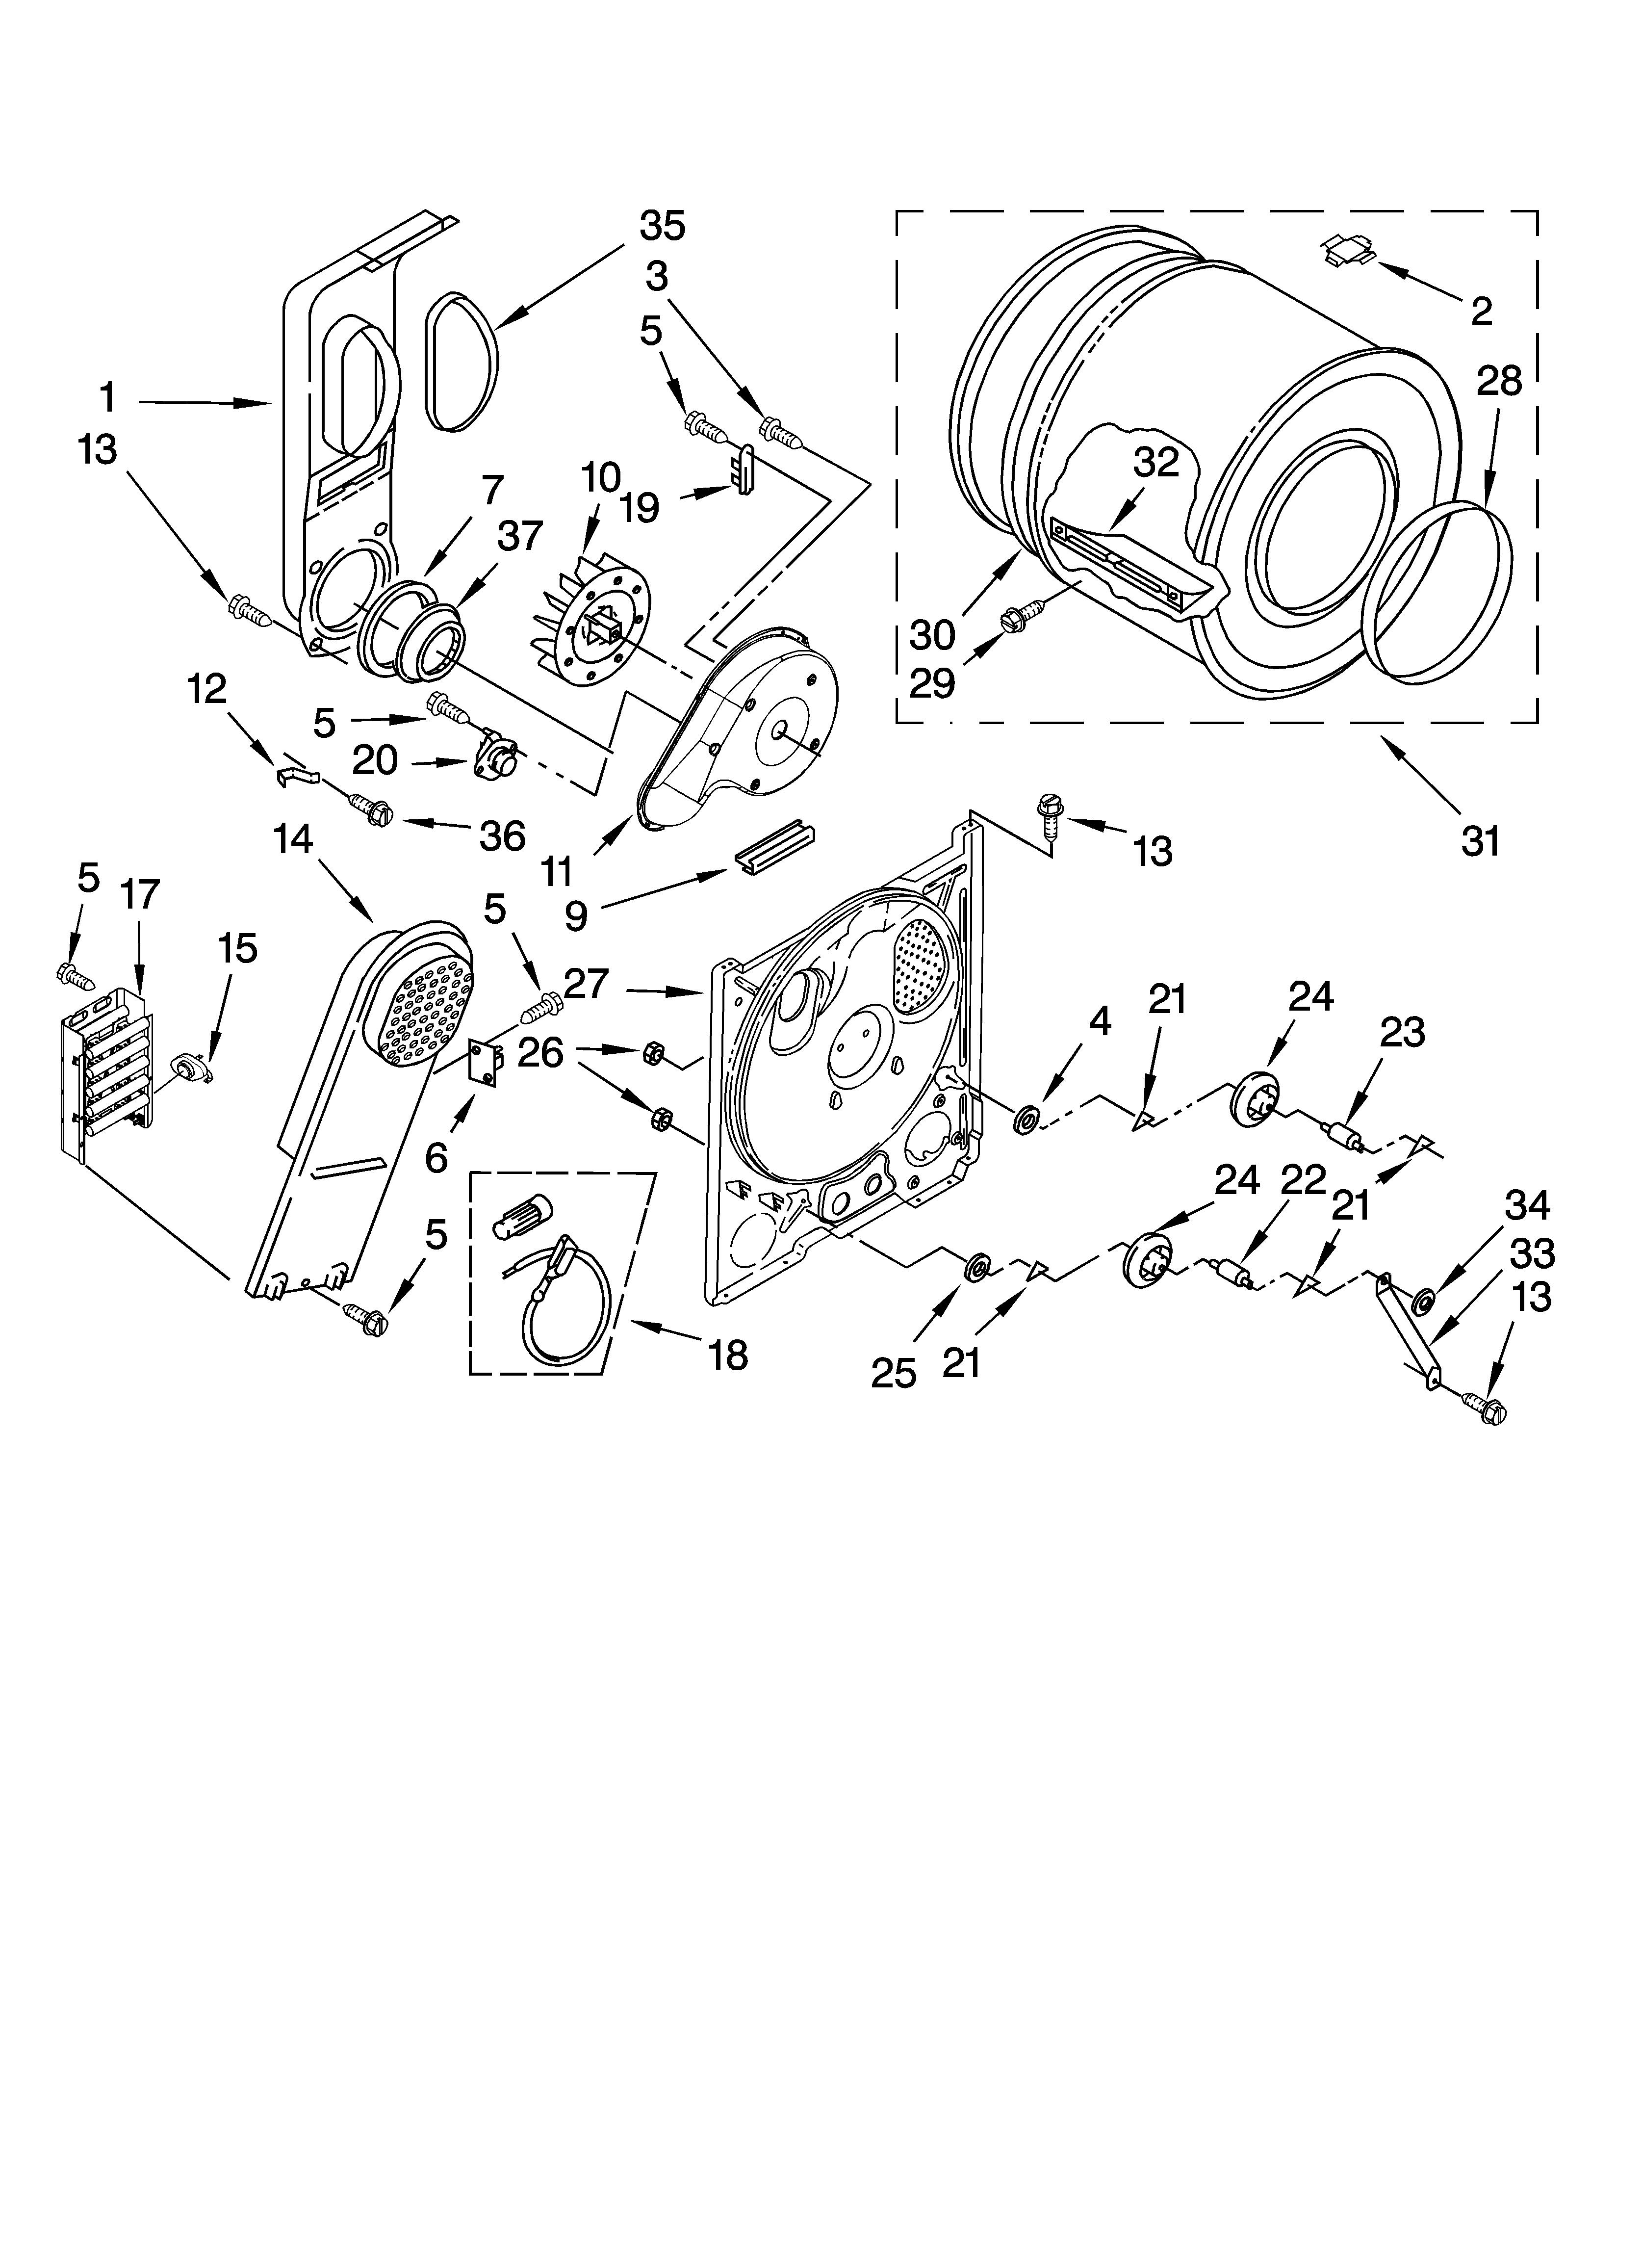 bulkhead parts  optional parts  not included  diagram